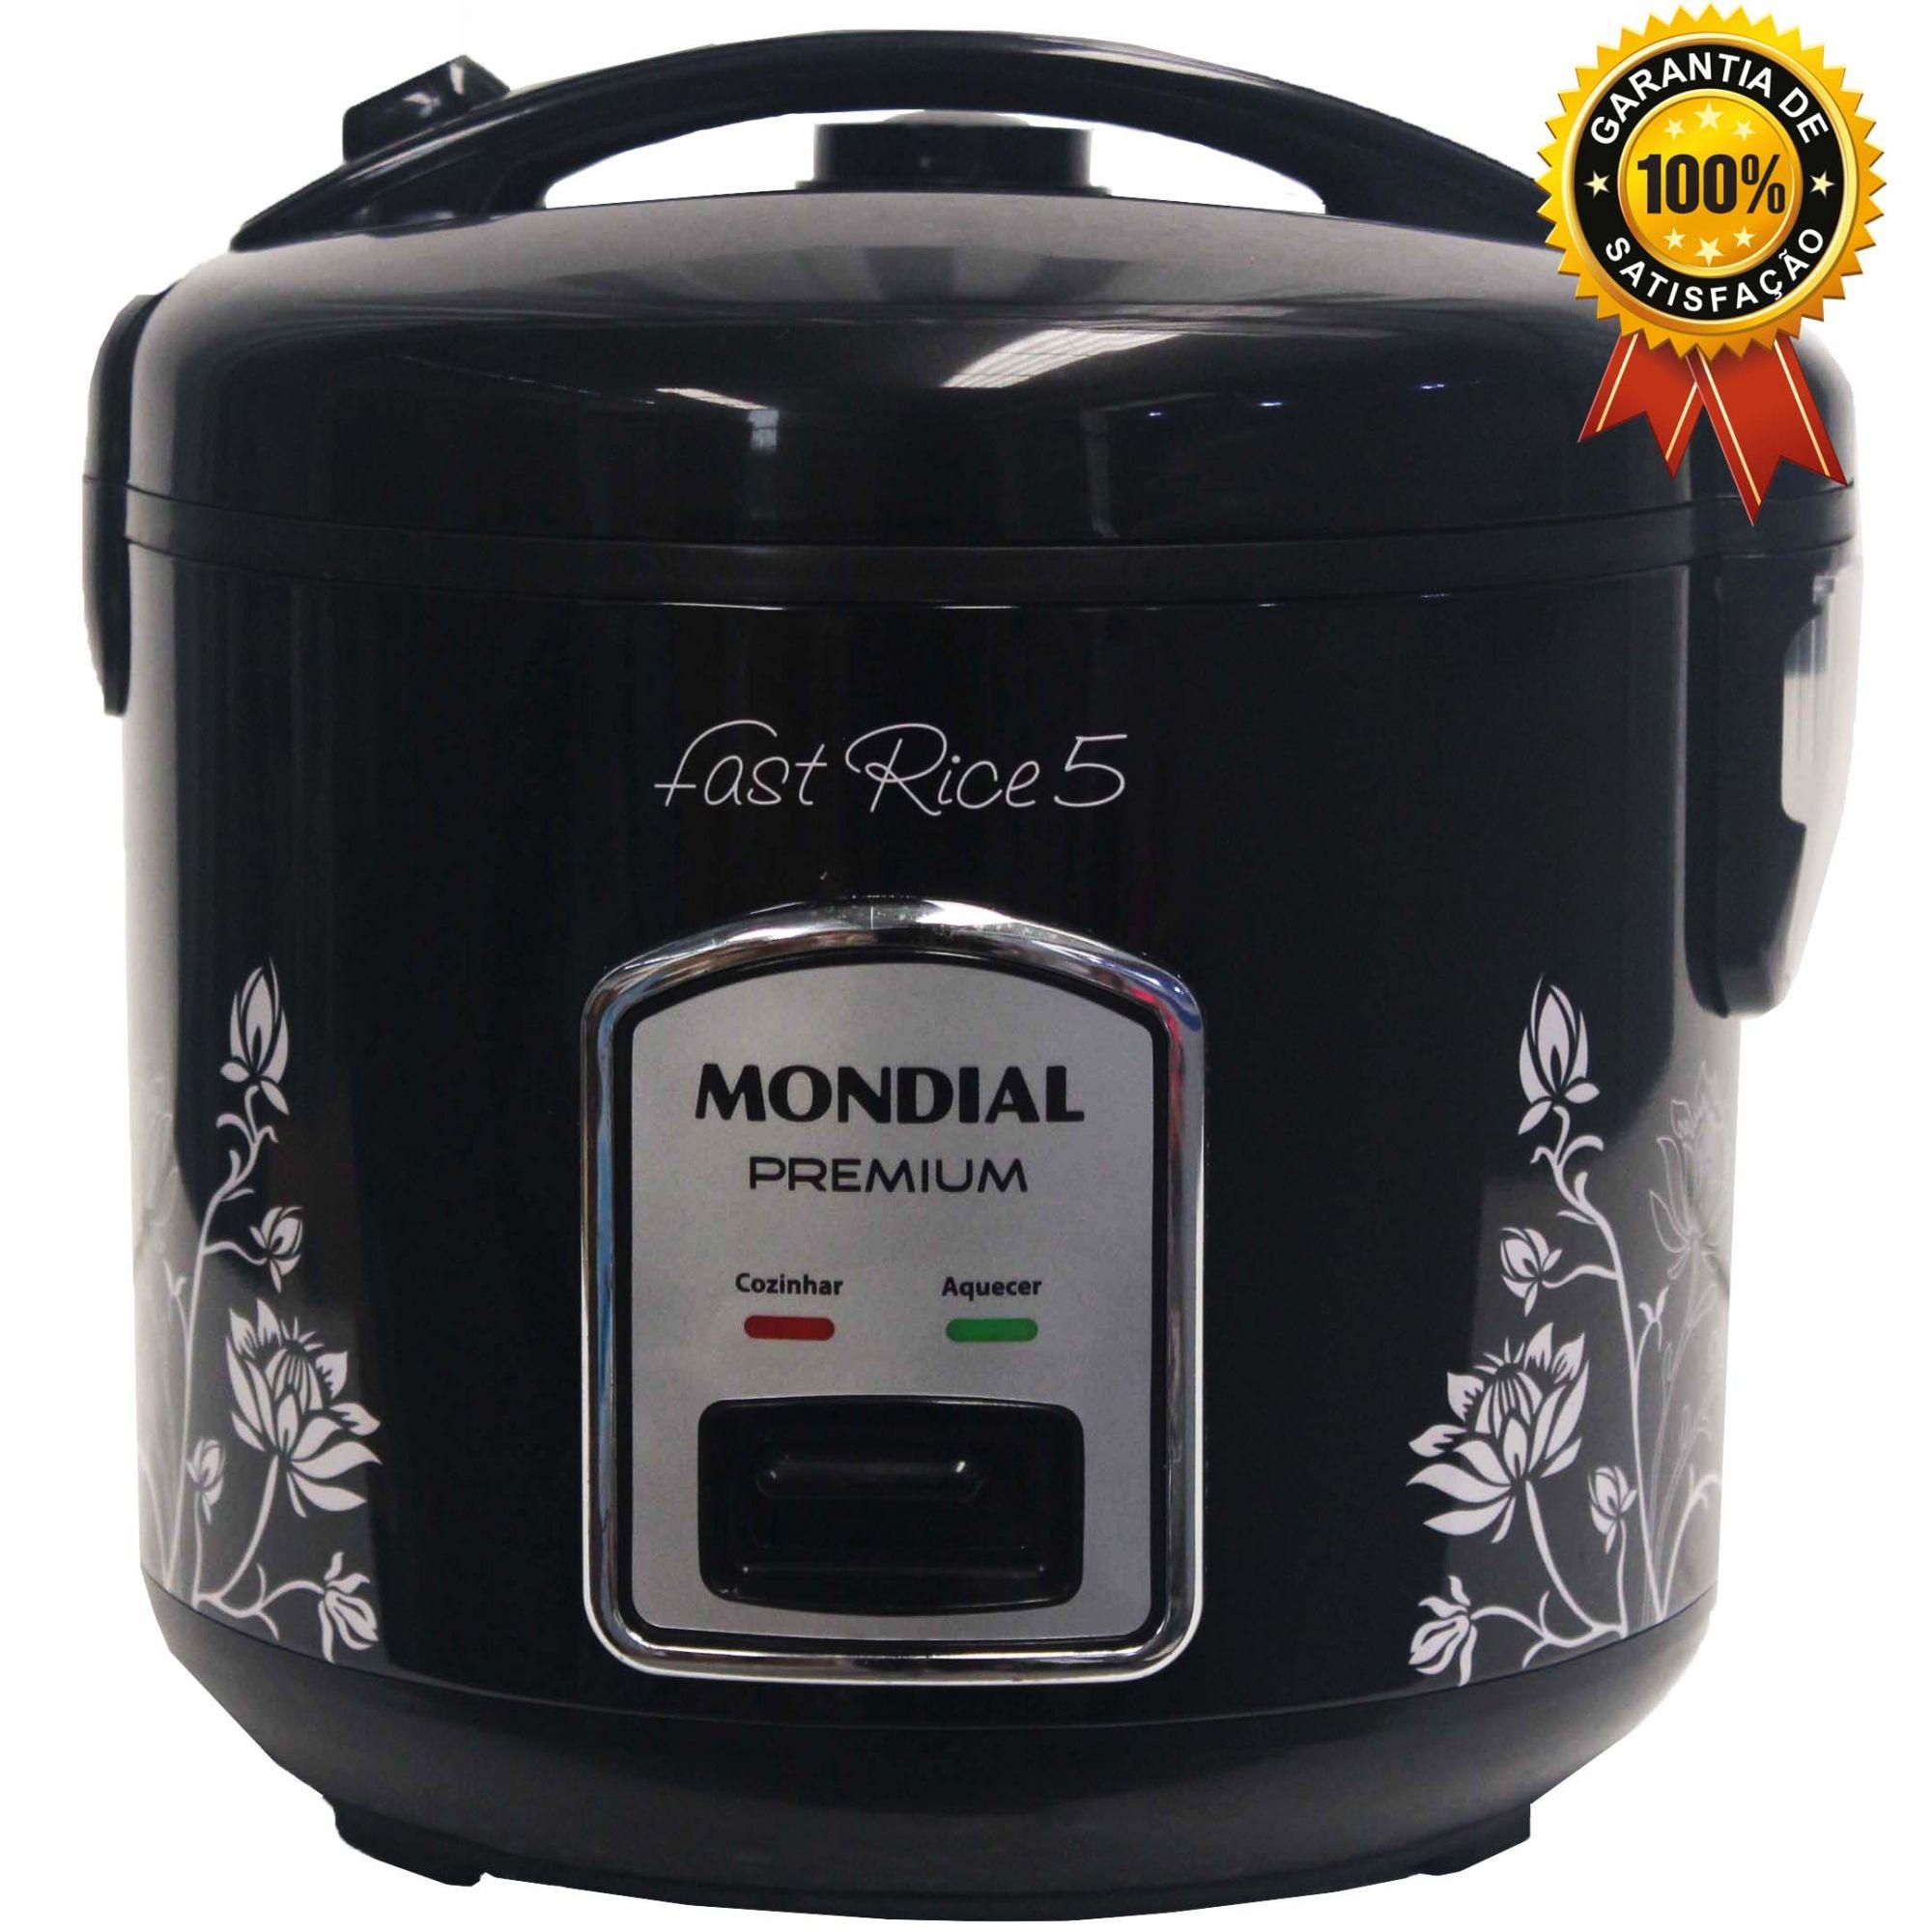 Panela De Arroz Elétrica 5 Xícaras Antiaderente Multifuncional 110V Preta Moderna Decorada Vapor Legumes Aquece 400 Watts Fast Rice Premium Mondial Original